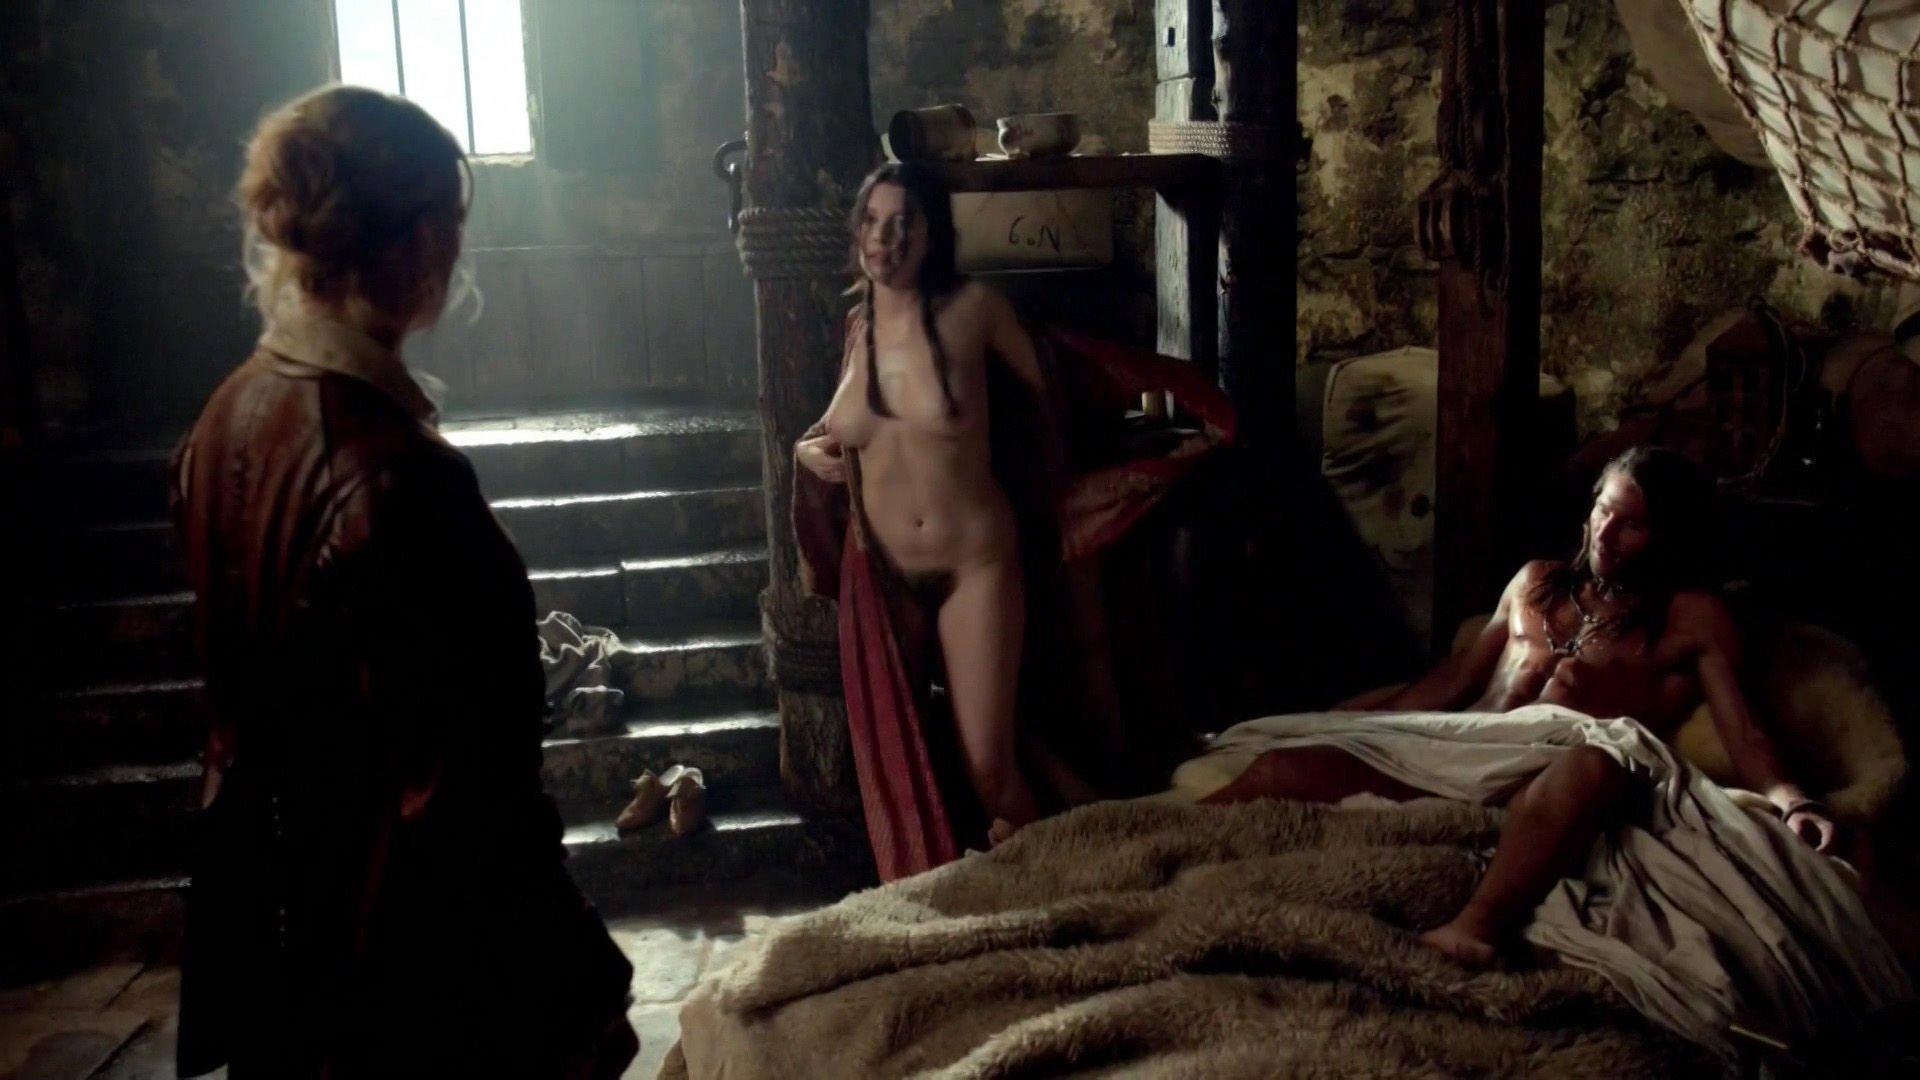 Finest Black Sails Blackbeard Nude Scenes